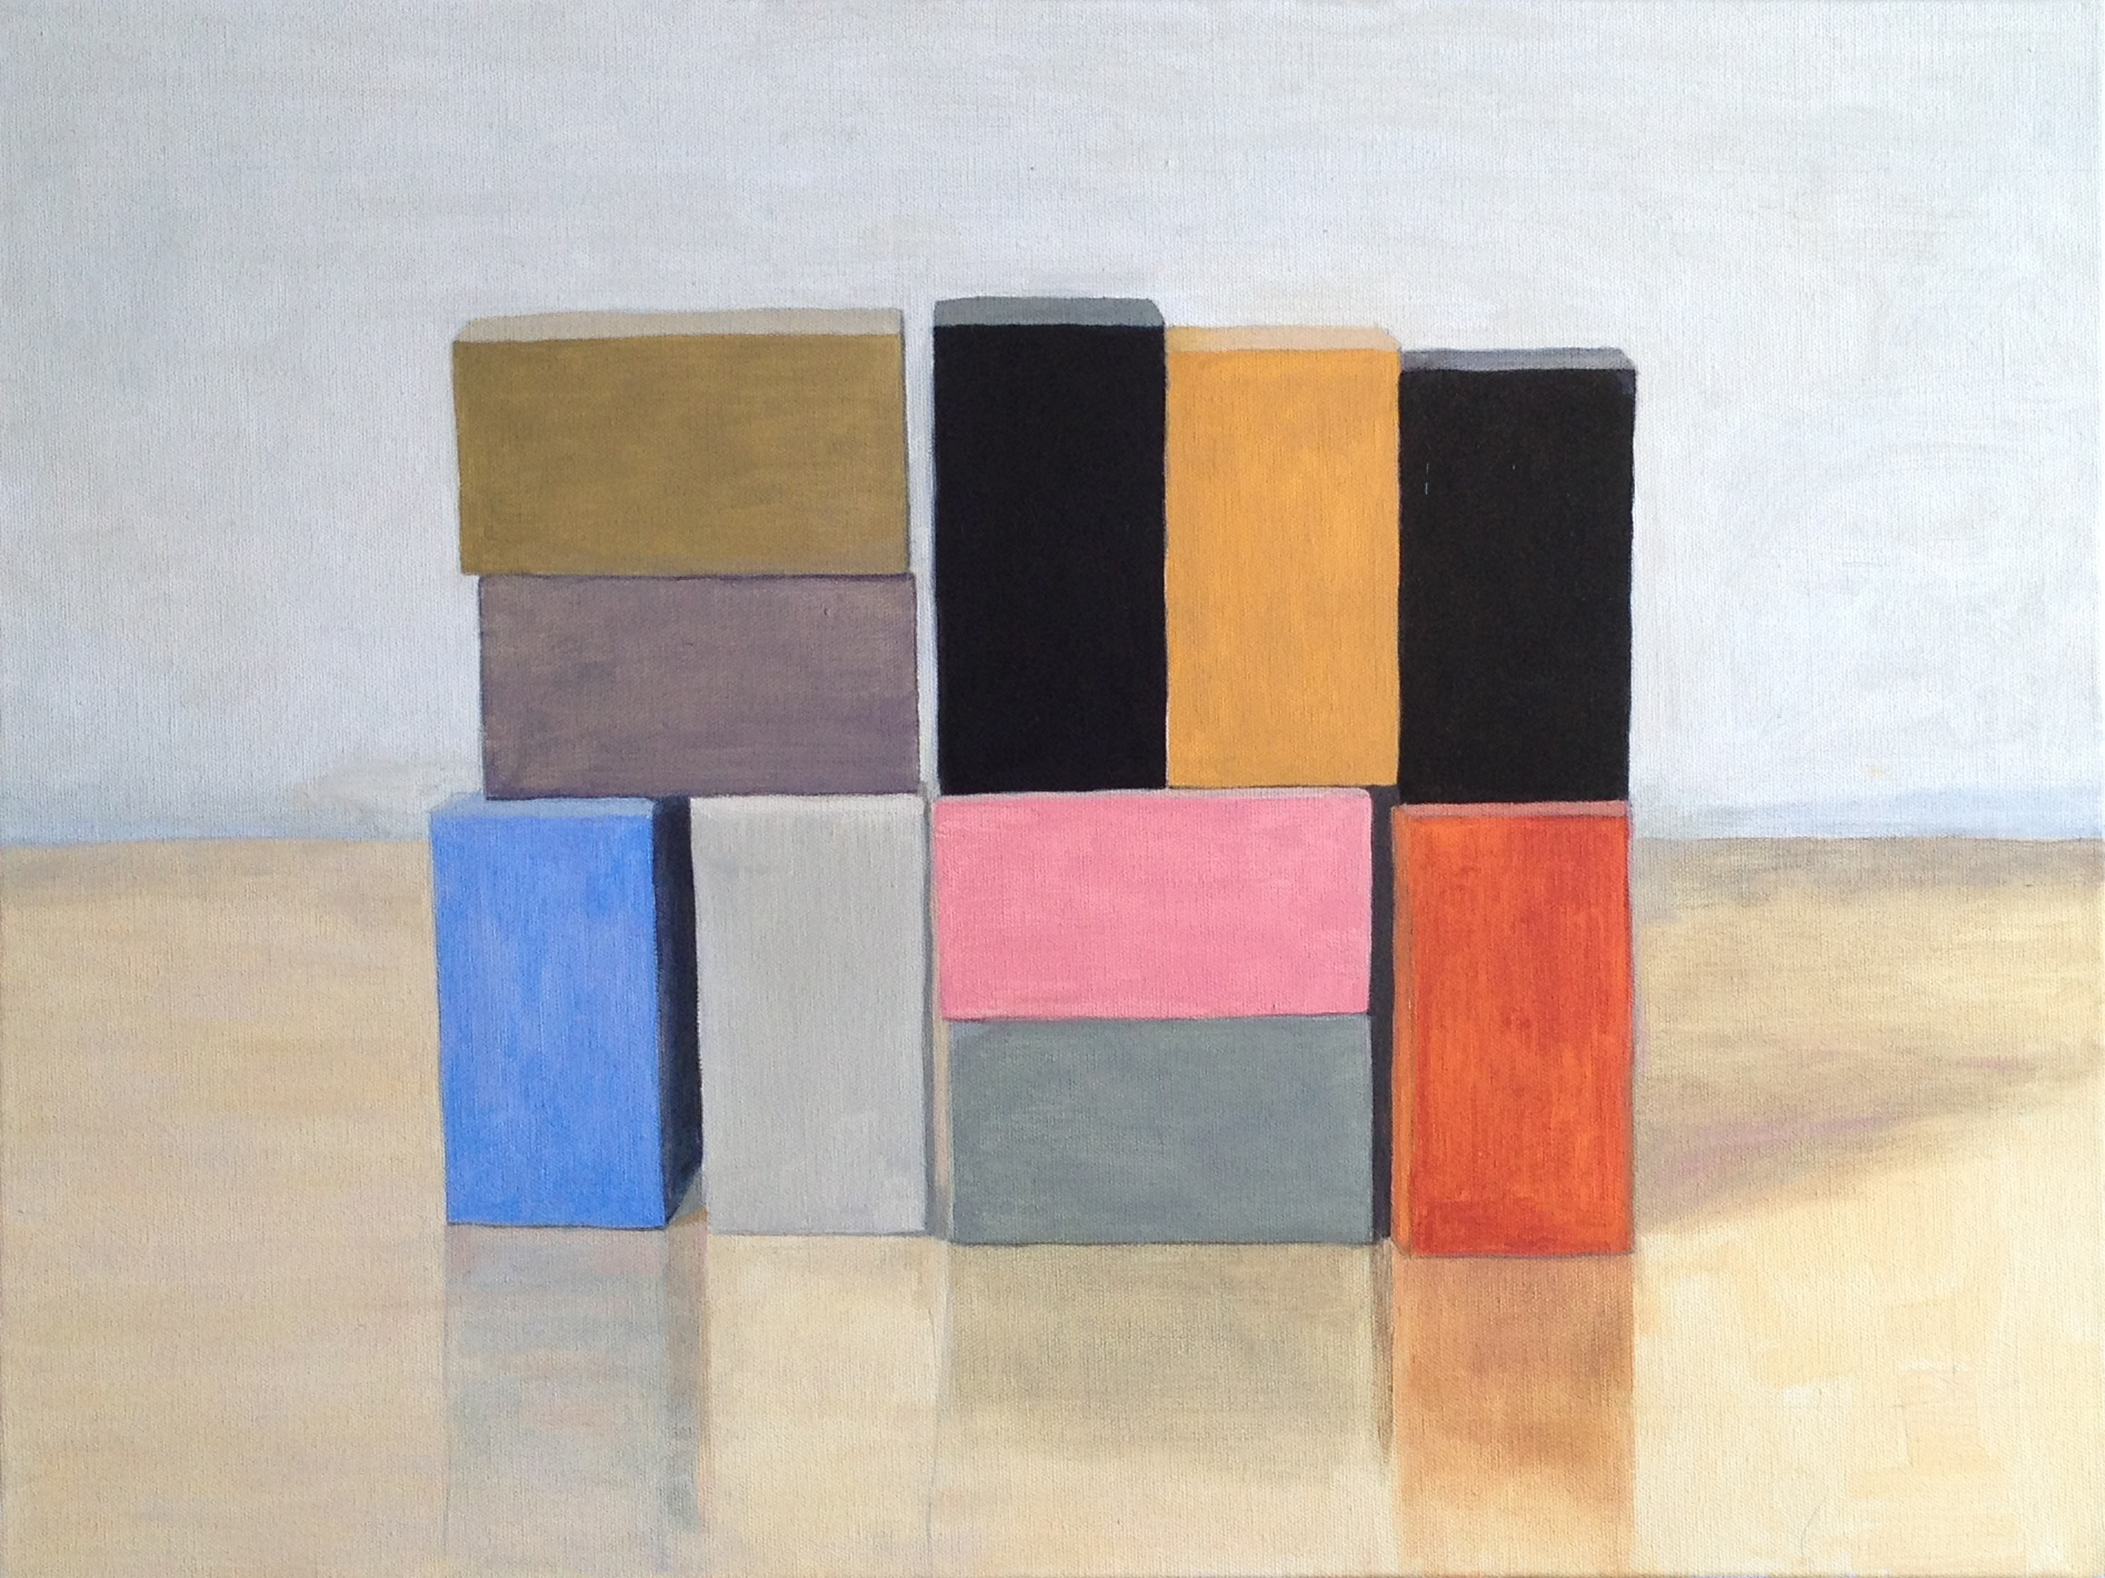 IM1006 Painted Blocks #1 (Interstices) (IMG_2262 (1)).jpg